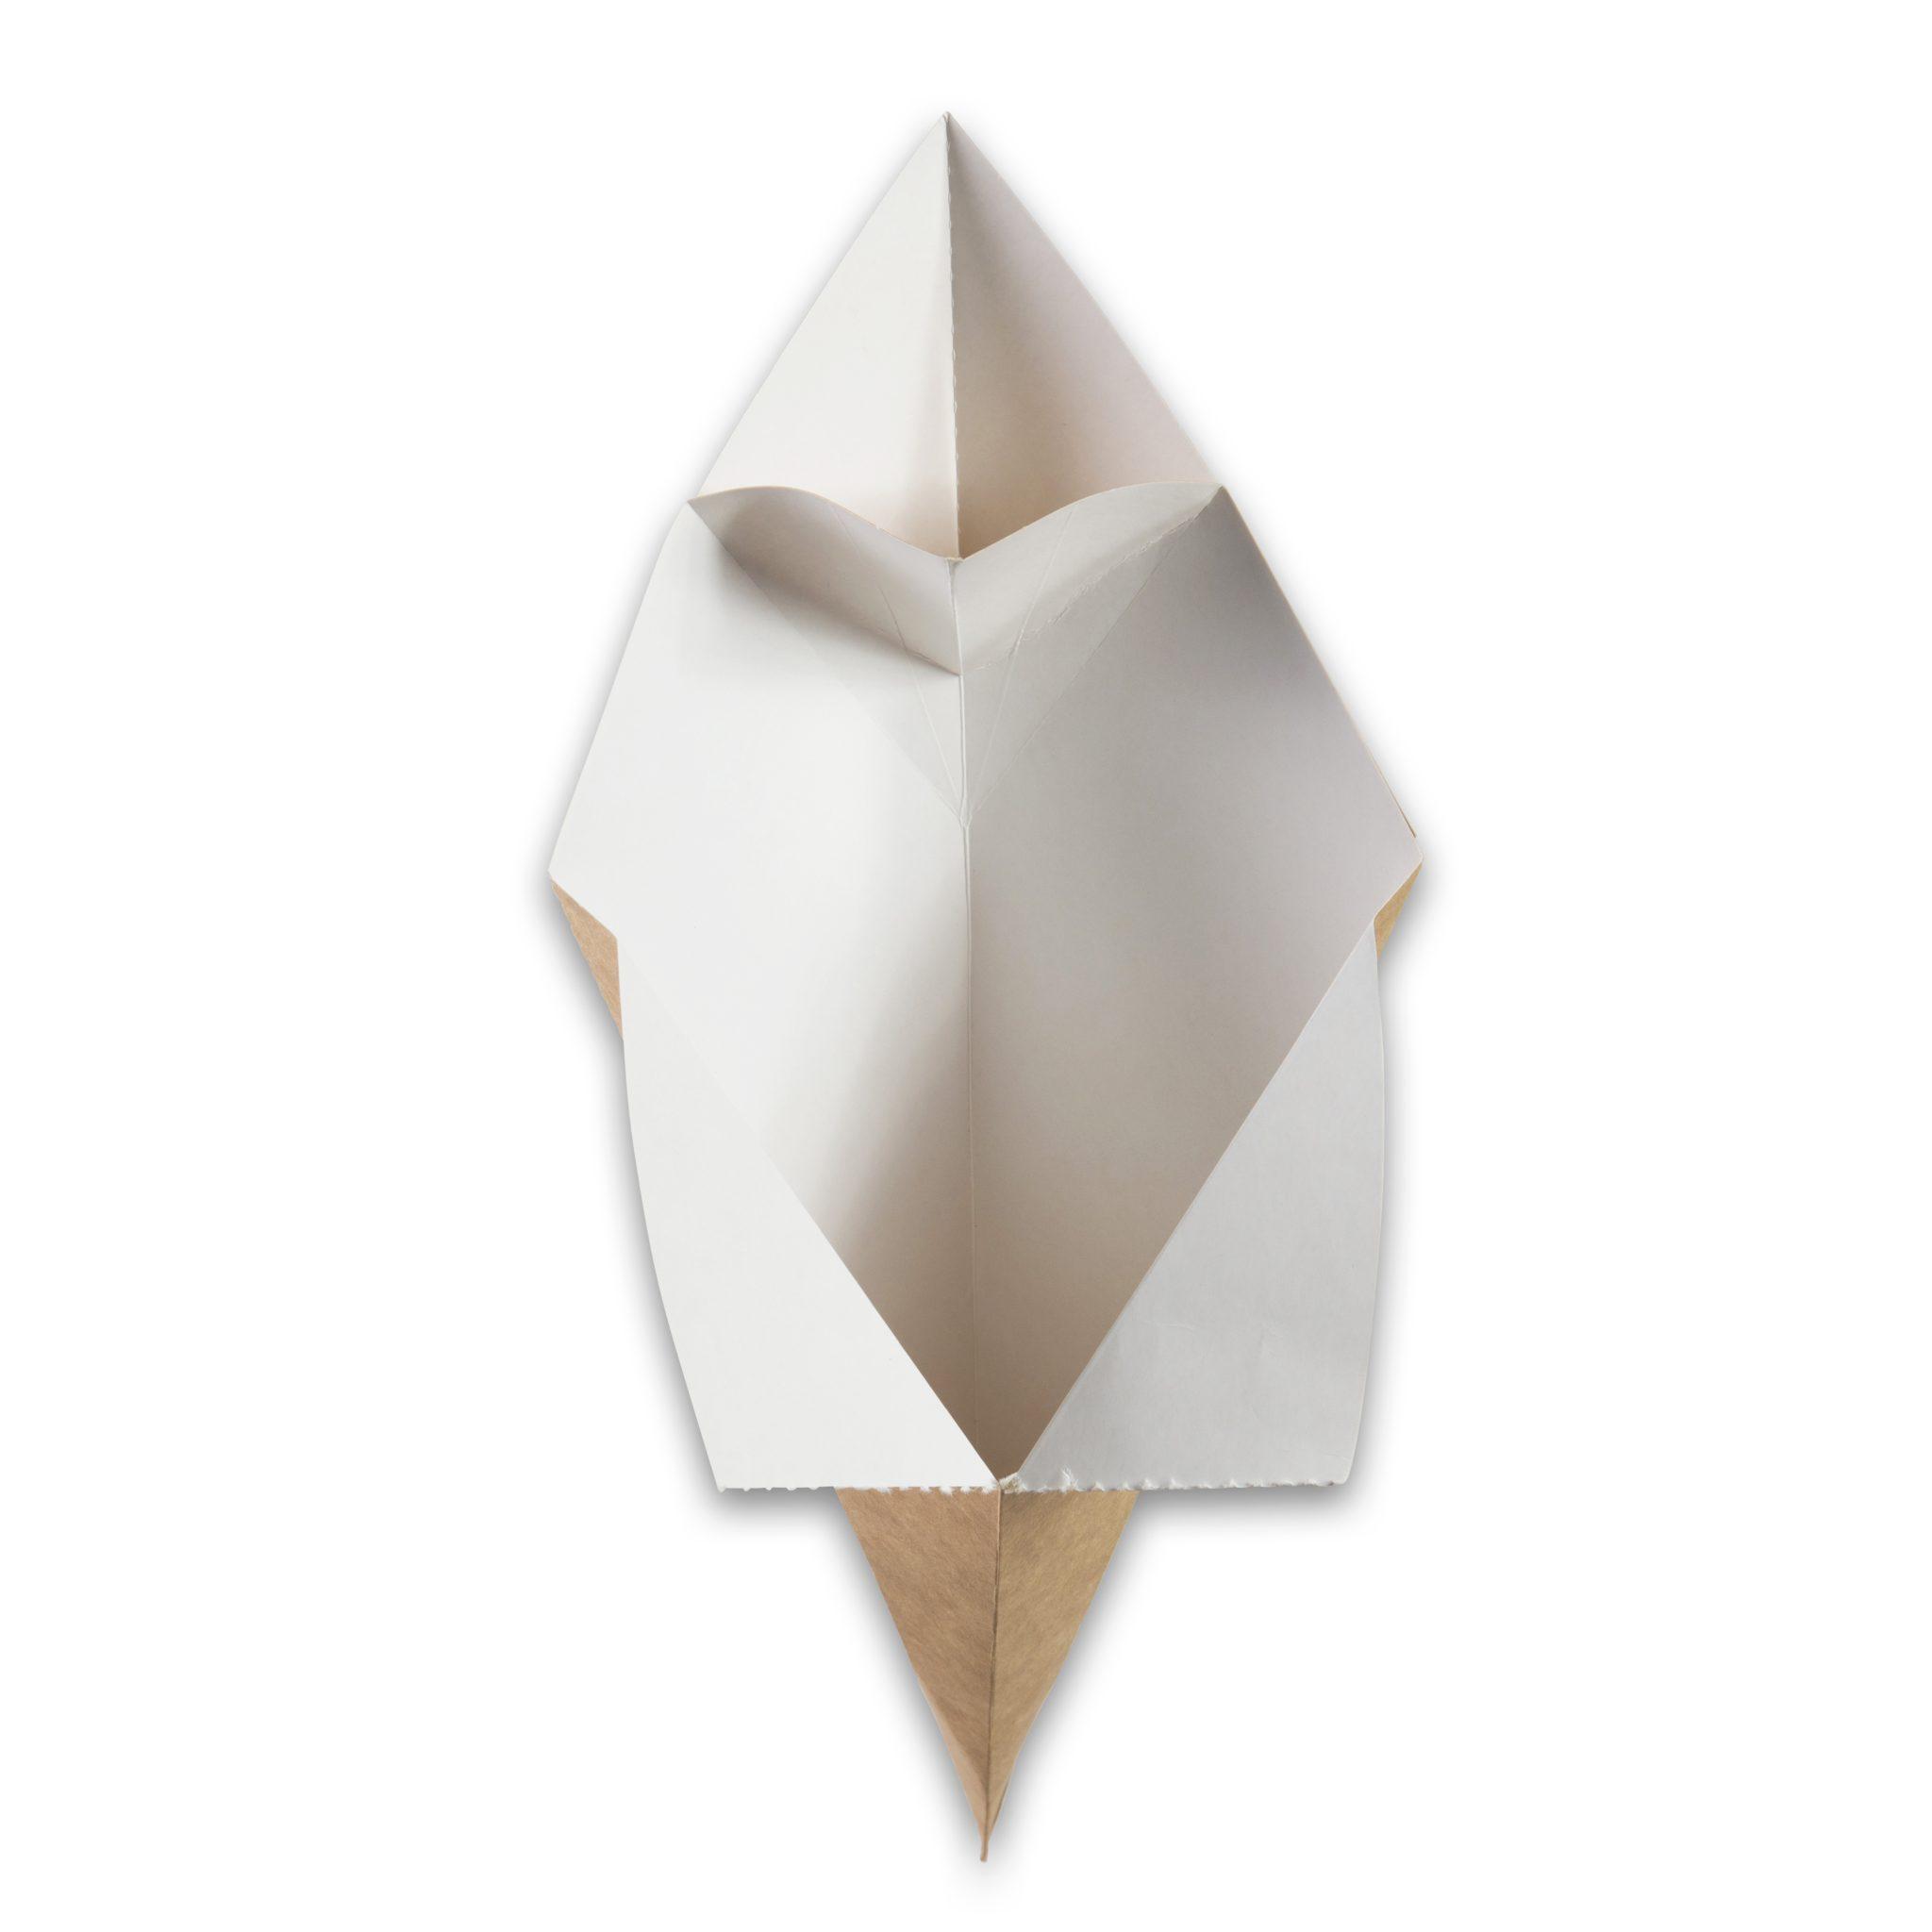 Kraft karton Frietzak met sausvak small 212x164x141 mm snackverpakking Chip 'n Dip klein (2)